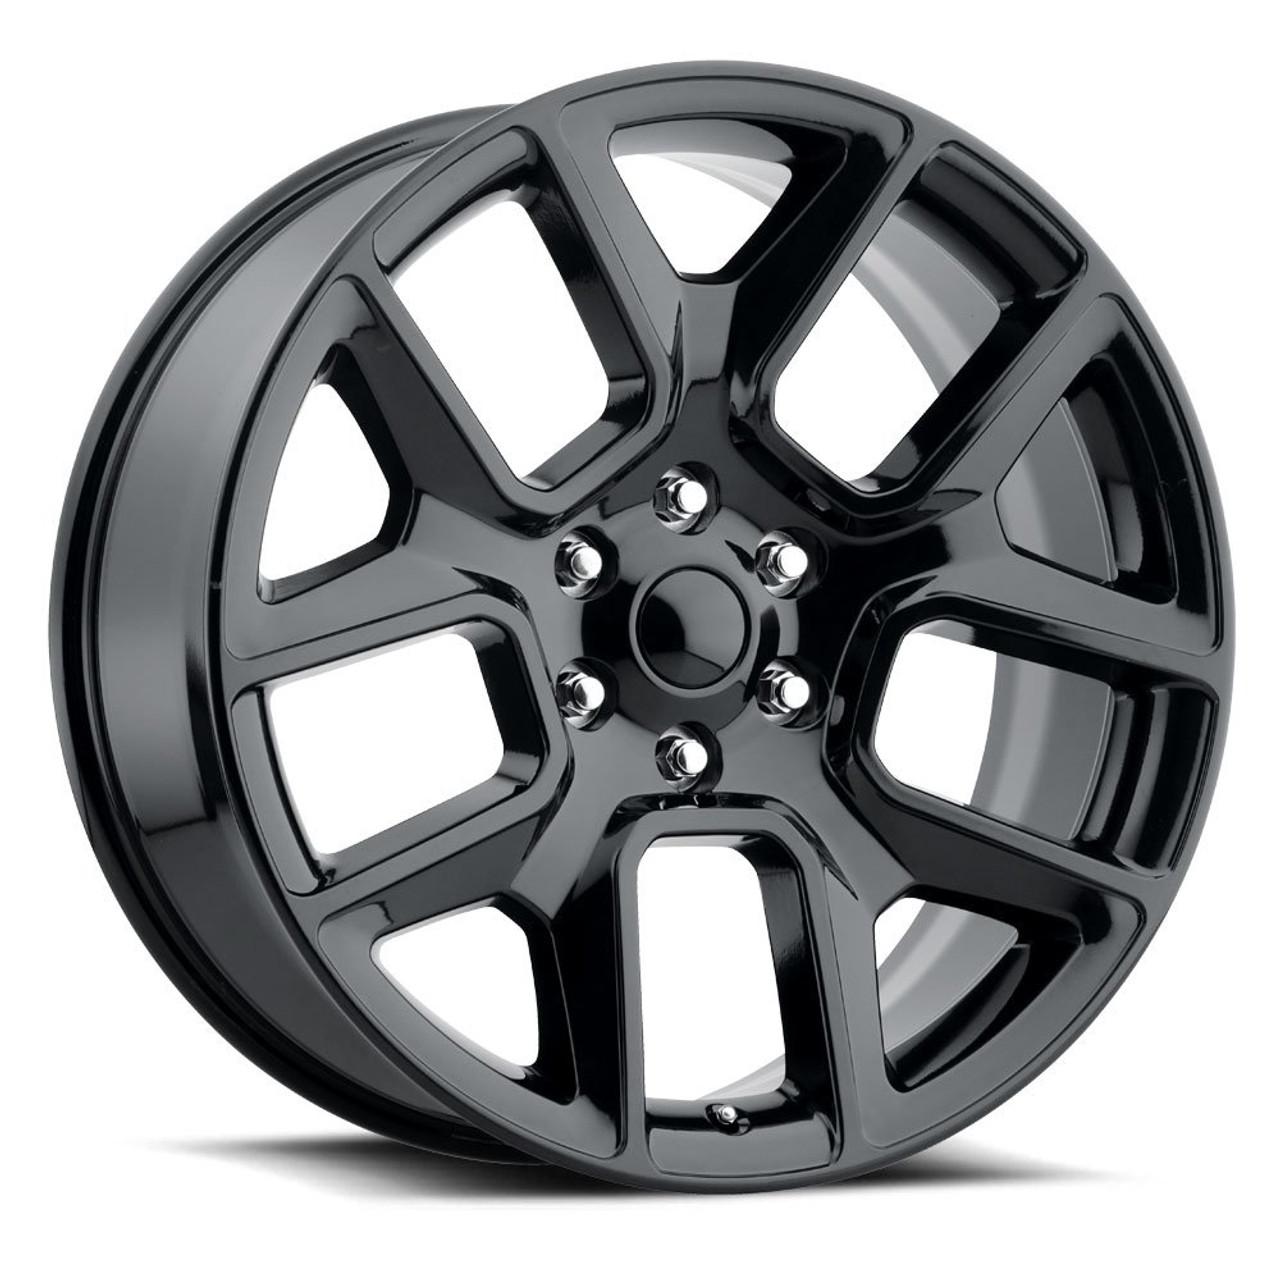 24 Fit S 2002 To 2018 Dodge Ram 1500 Ram Laramie Hemi Dakota Durango Wheels Gloss Black 5x139 Set Of 4 24x10 Rims Stock Wheel Solutions